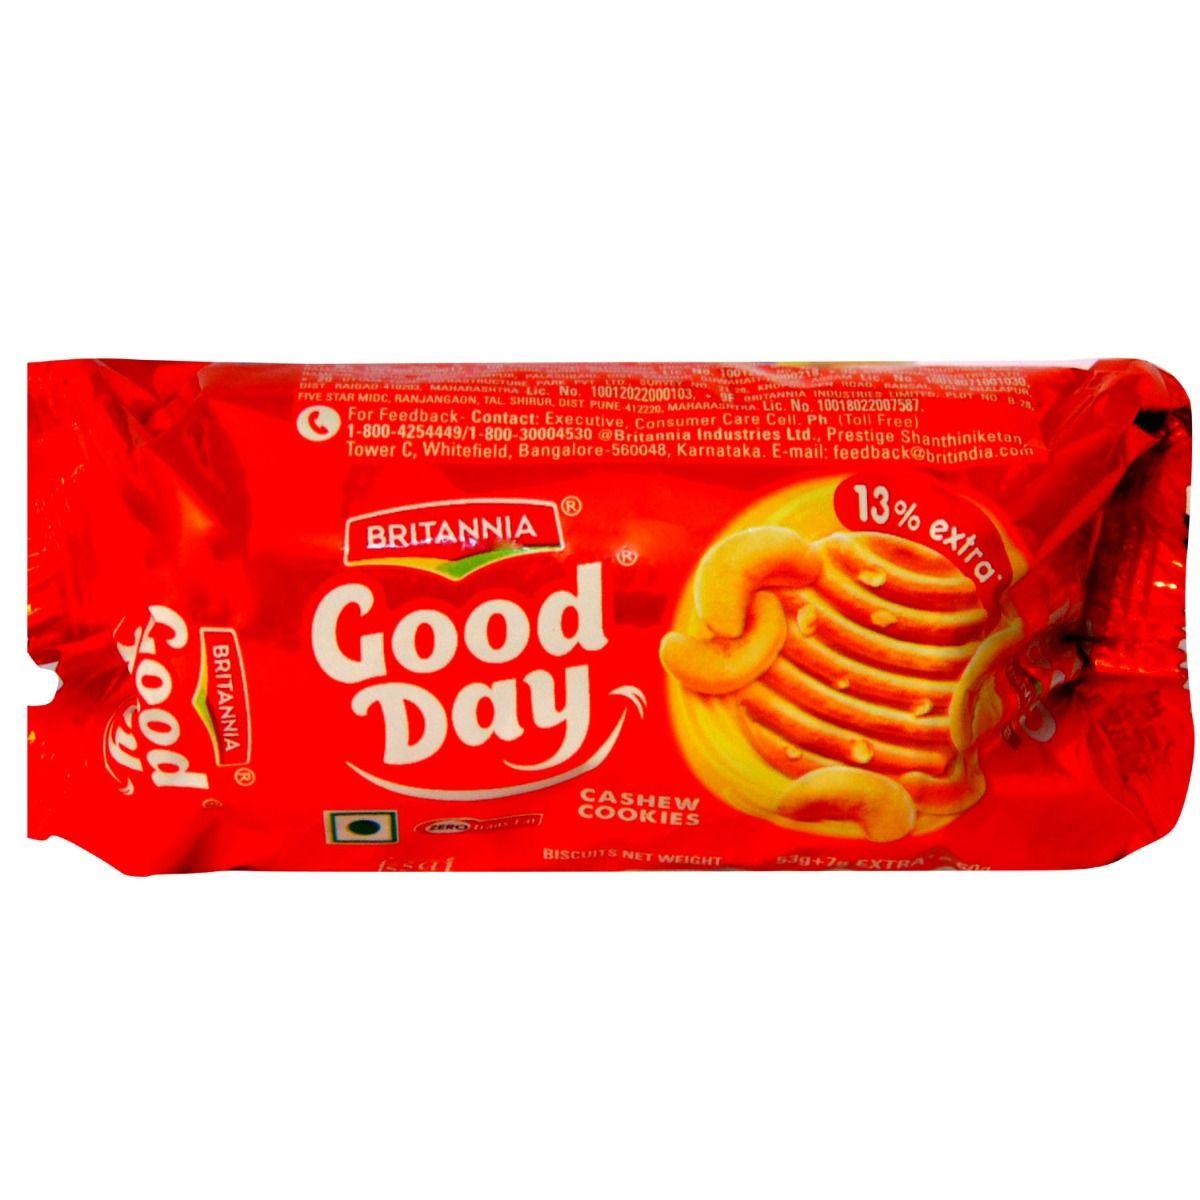 Britannia Good Day Cashew Cookies, 58 gm